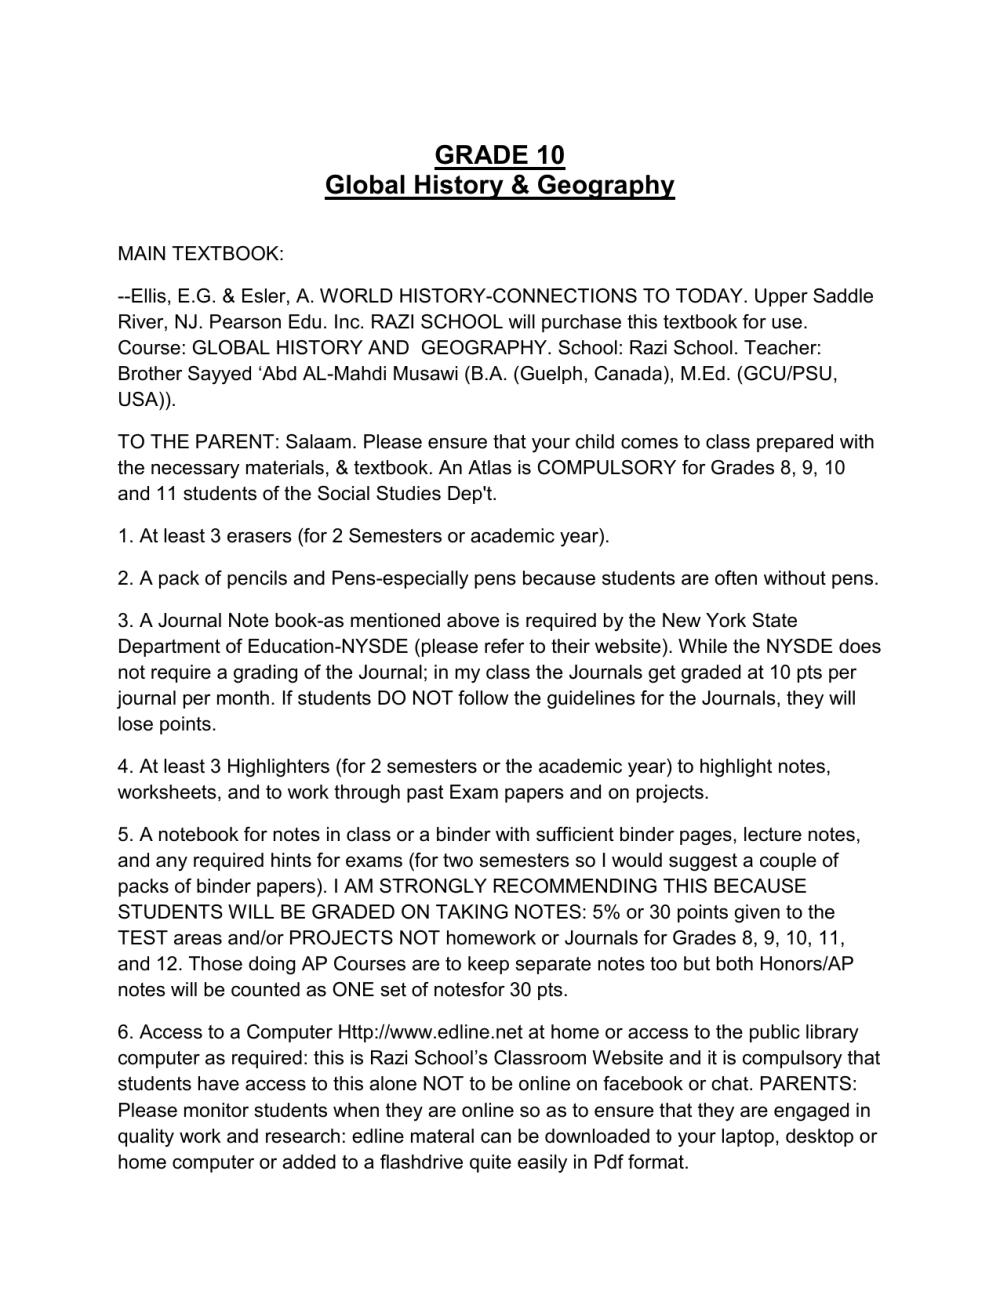 medium resolution of Grade 10 Global History \u0026 Geography